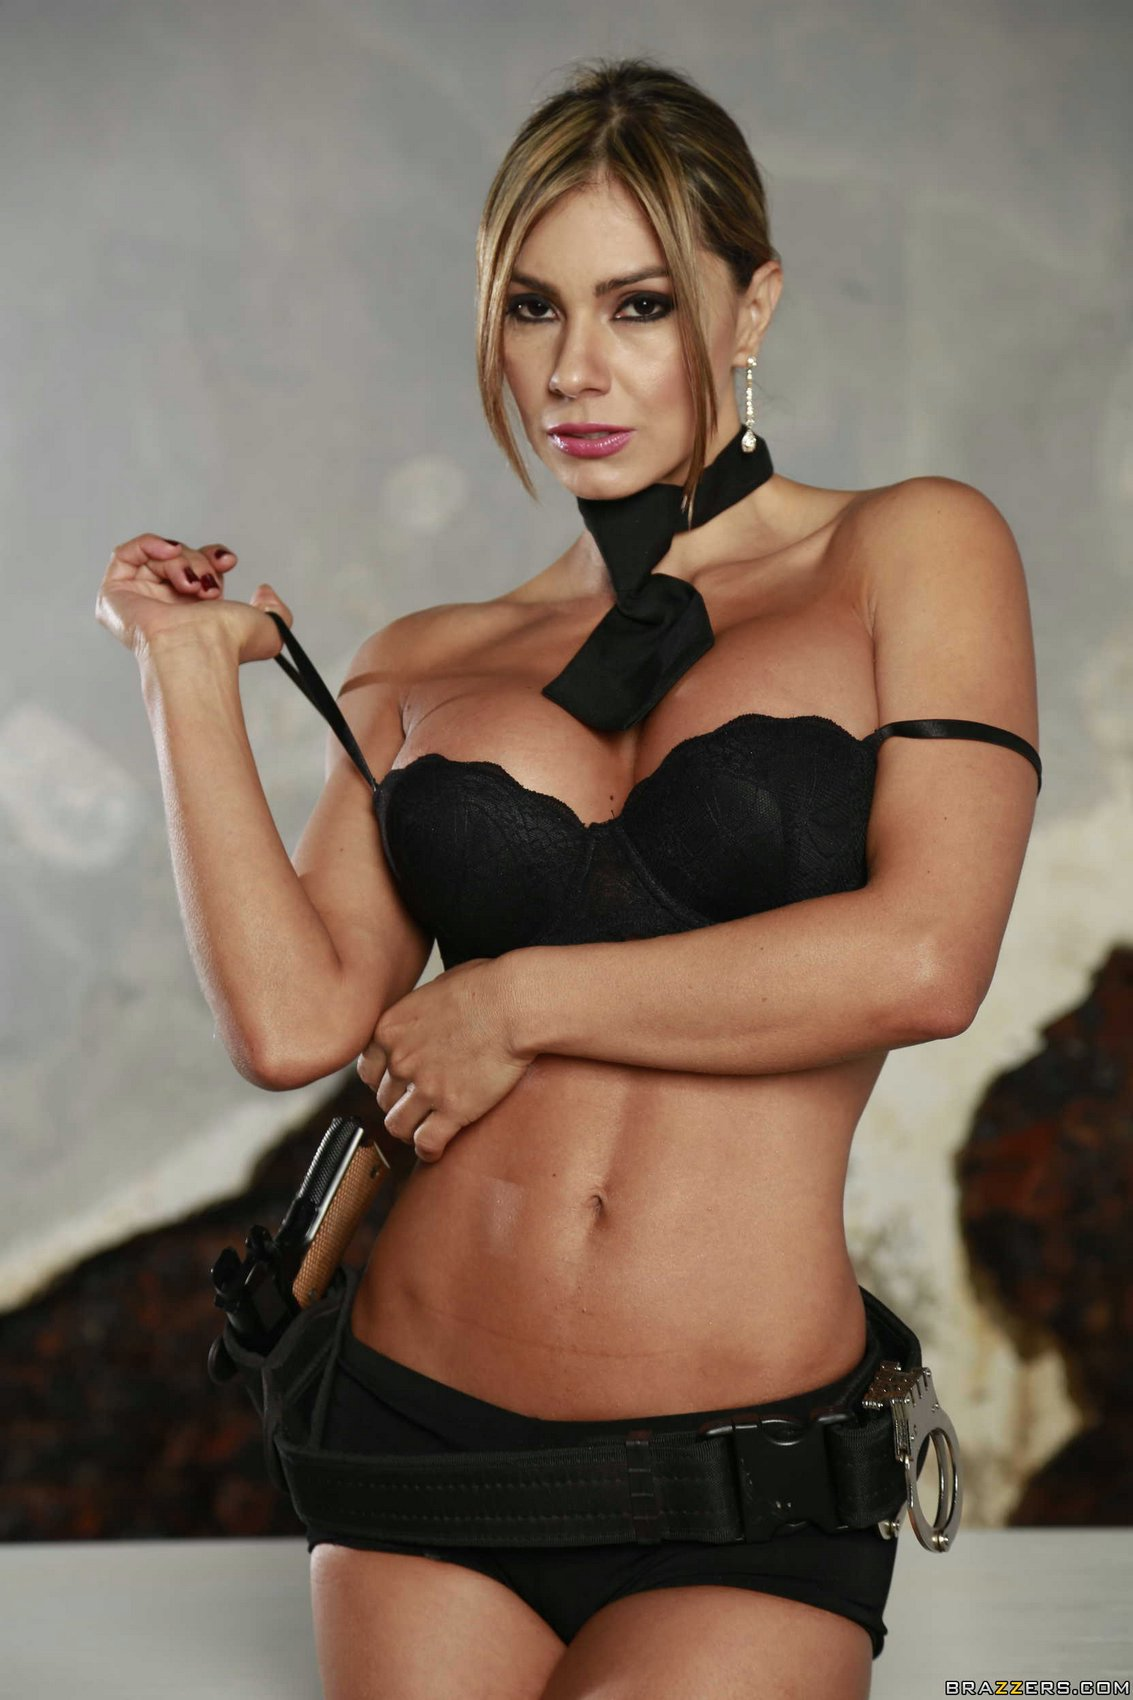 Blonde girl ukraine dating 851